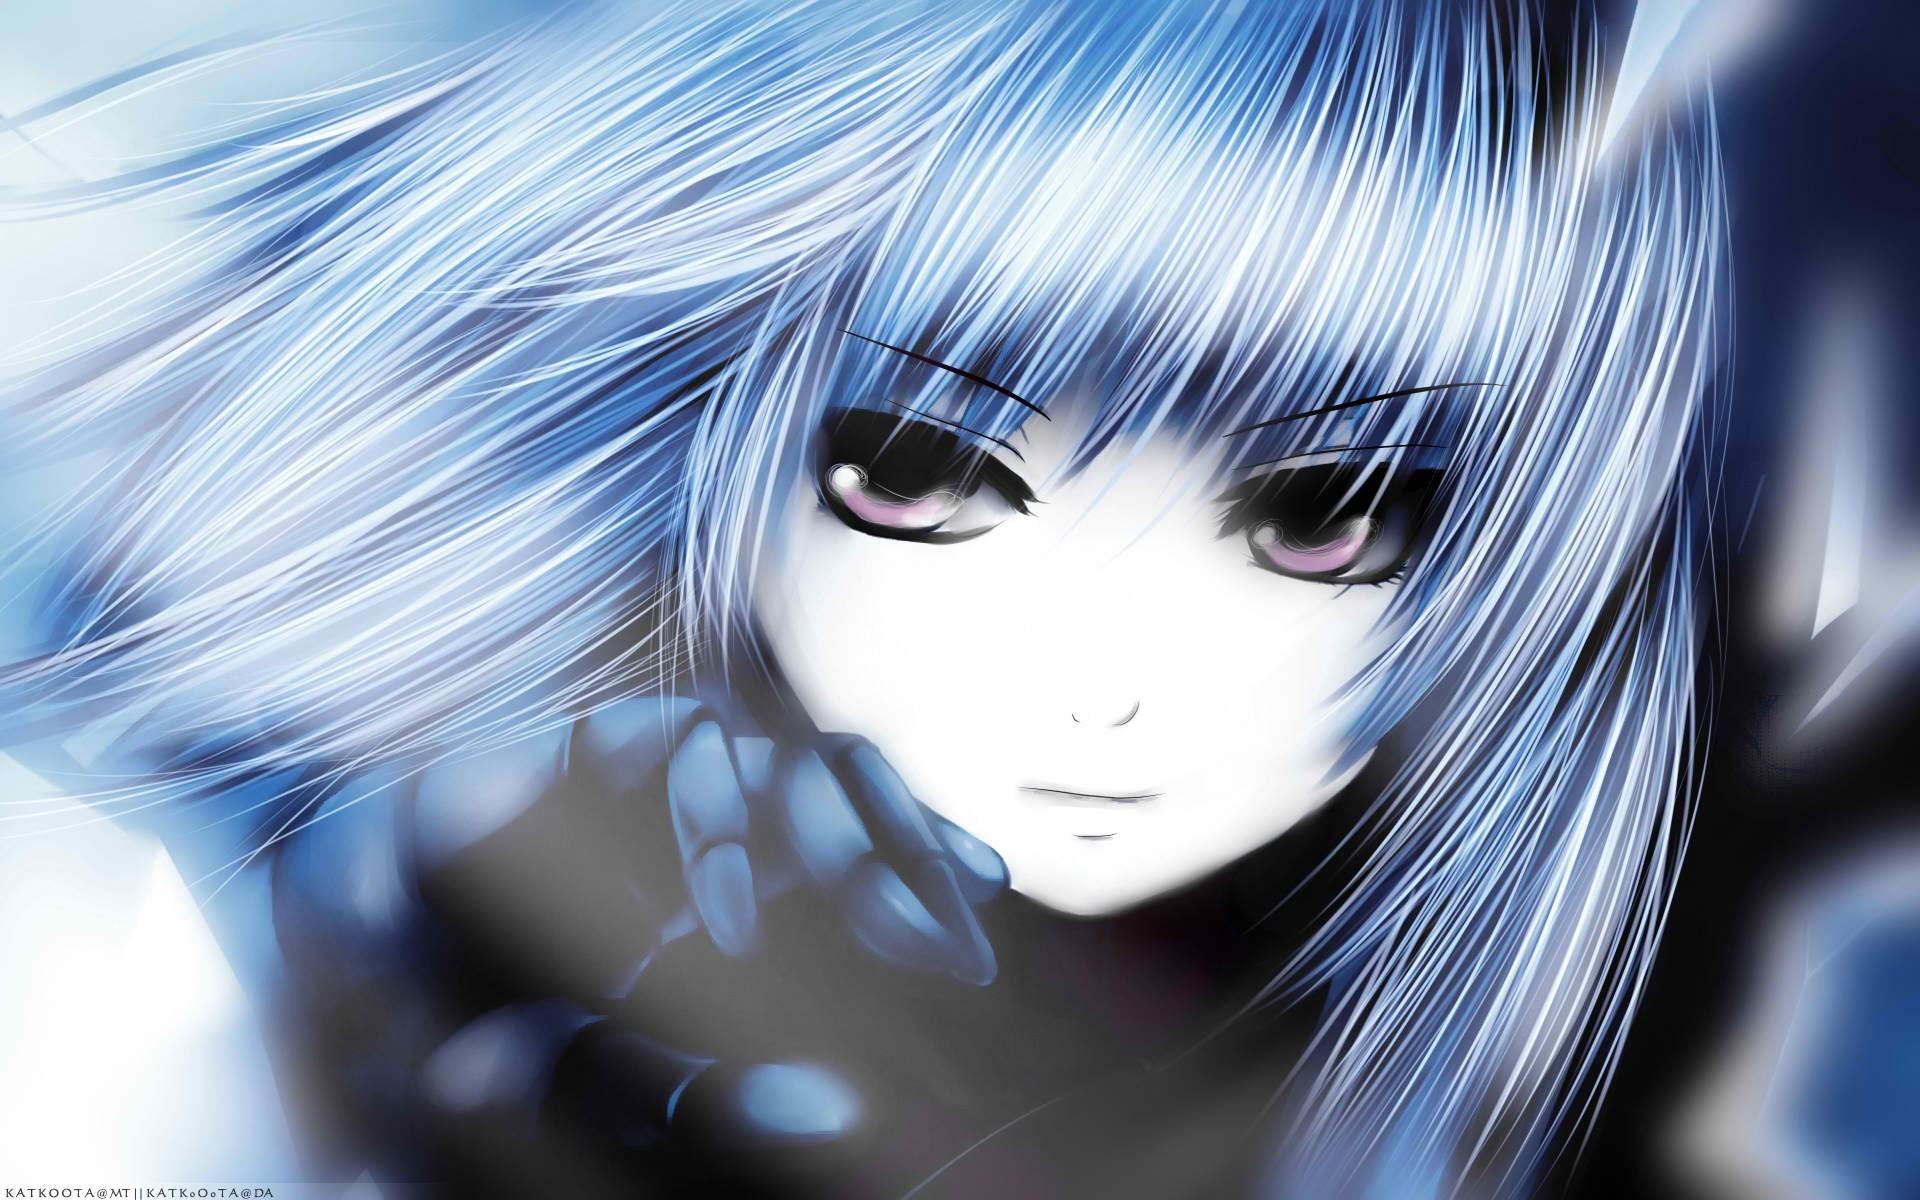 Face Anime Anime Girls Blue Hair Gloves Manga Blue King Of Fighters Kula Diamond Coffee Kizoku